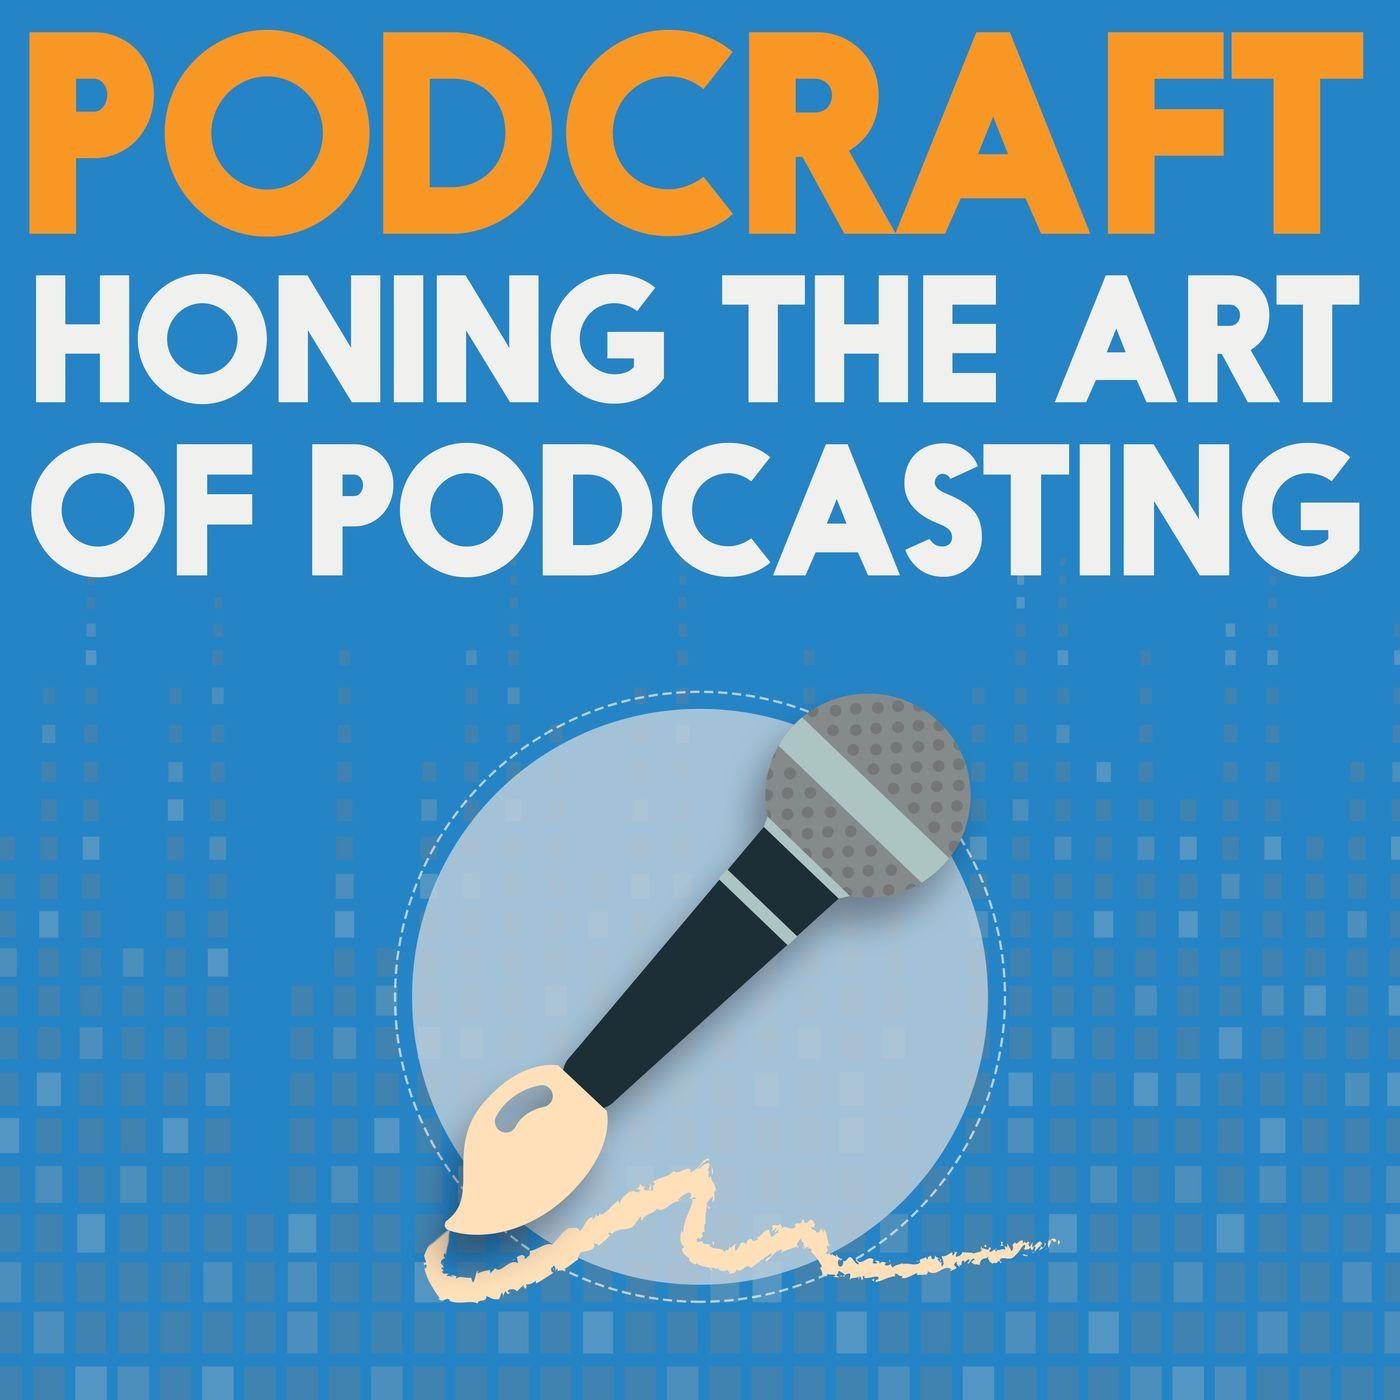 Podcast Branding: Artwork and Music   Podcraft 1010